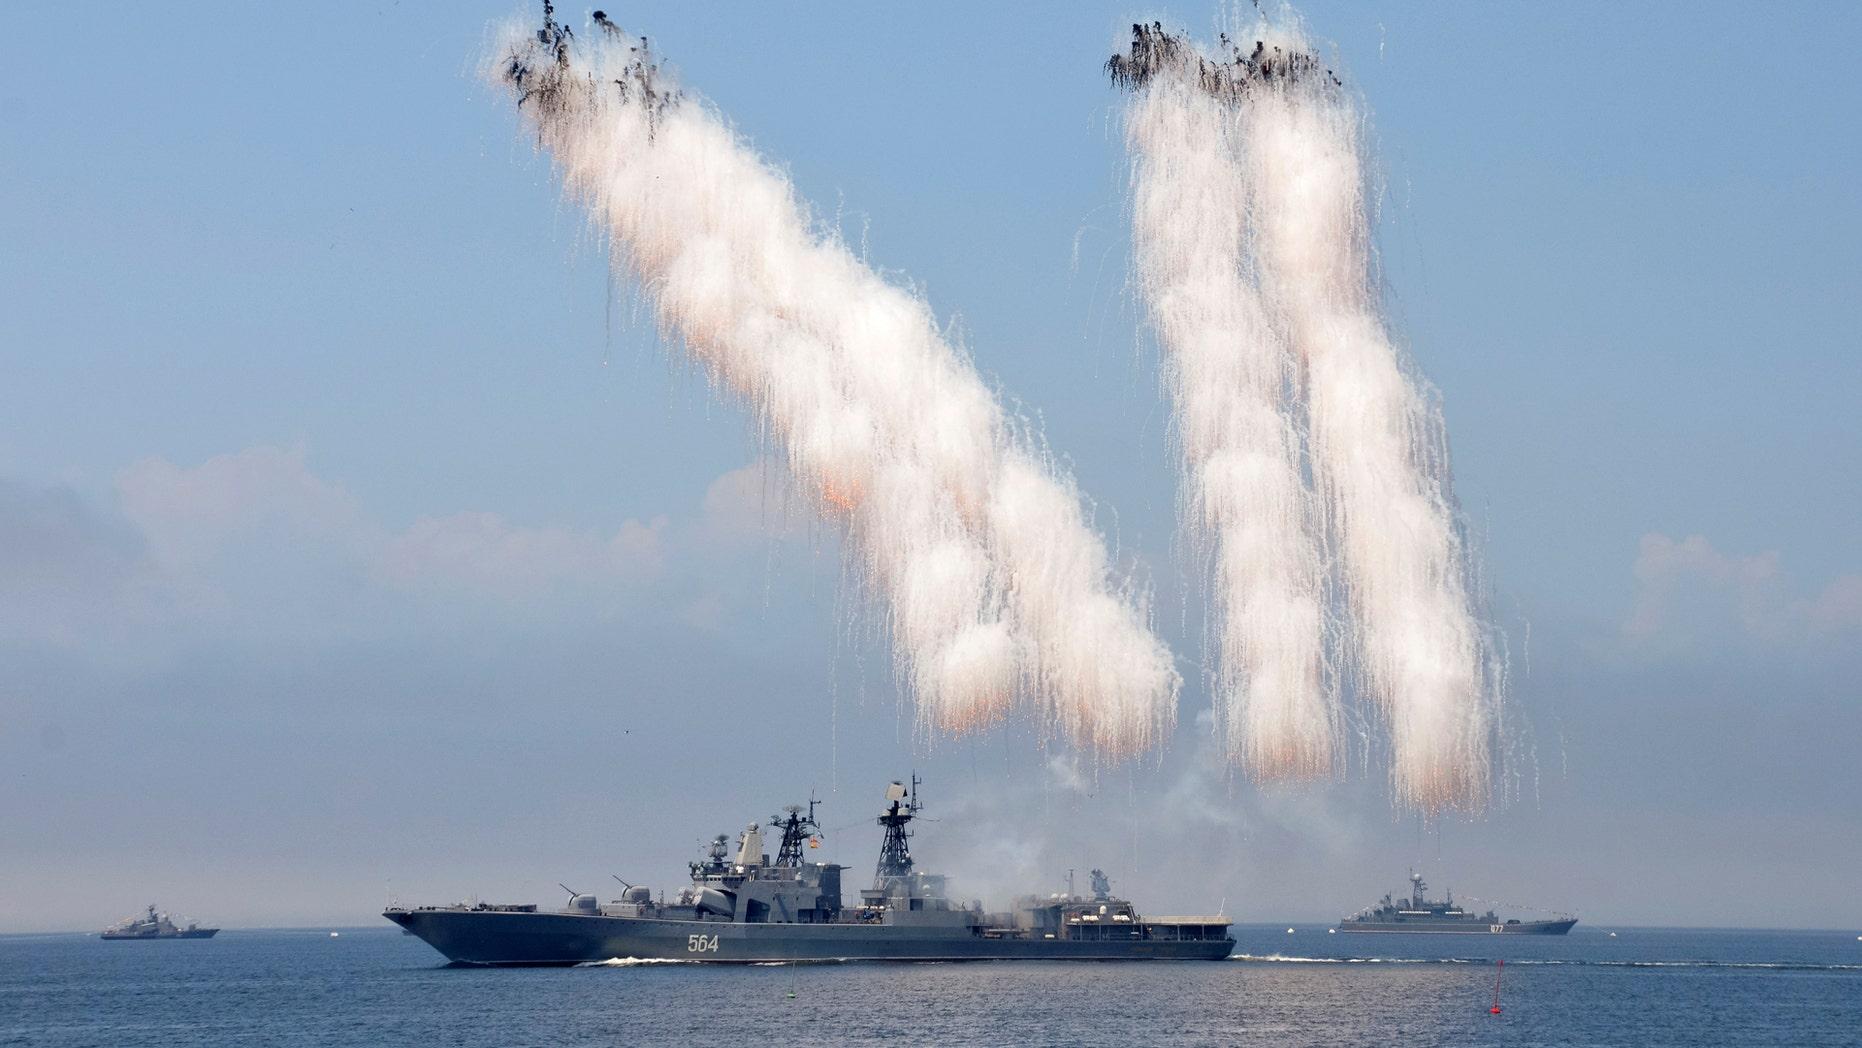 Russia develops hypersonic 4,600 mph Zircon missile | Fox News